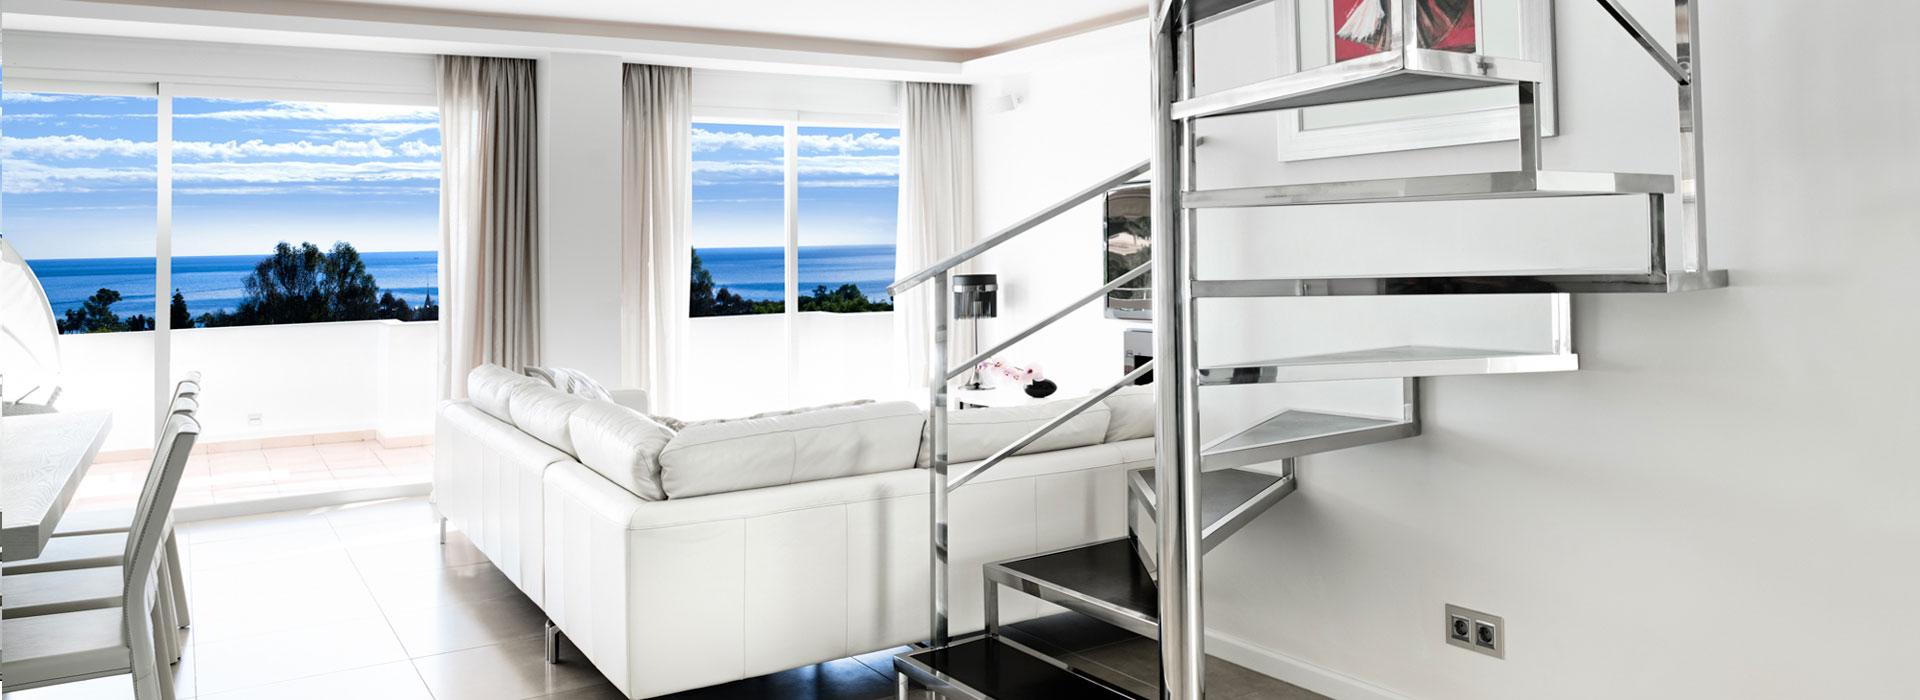 Fotógrafo Arquitectura Inmobiliaria Málaga, Marbella, Sotogrande, Benahavis